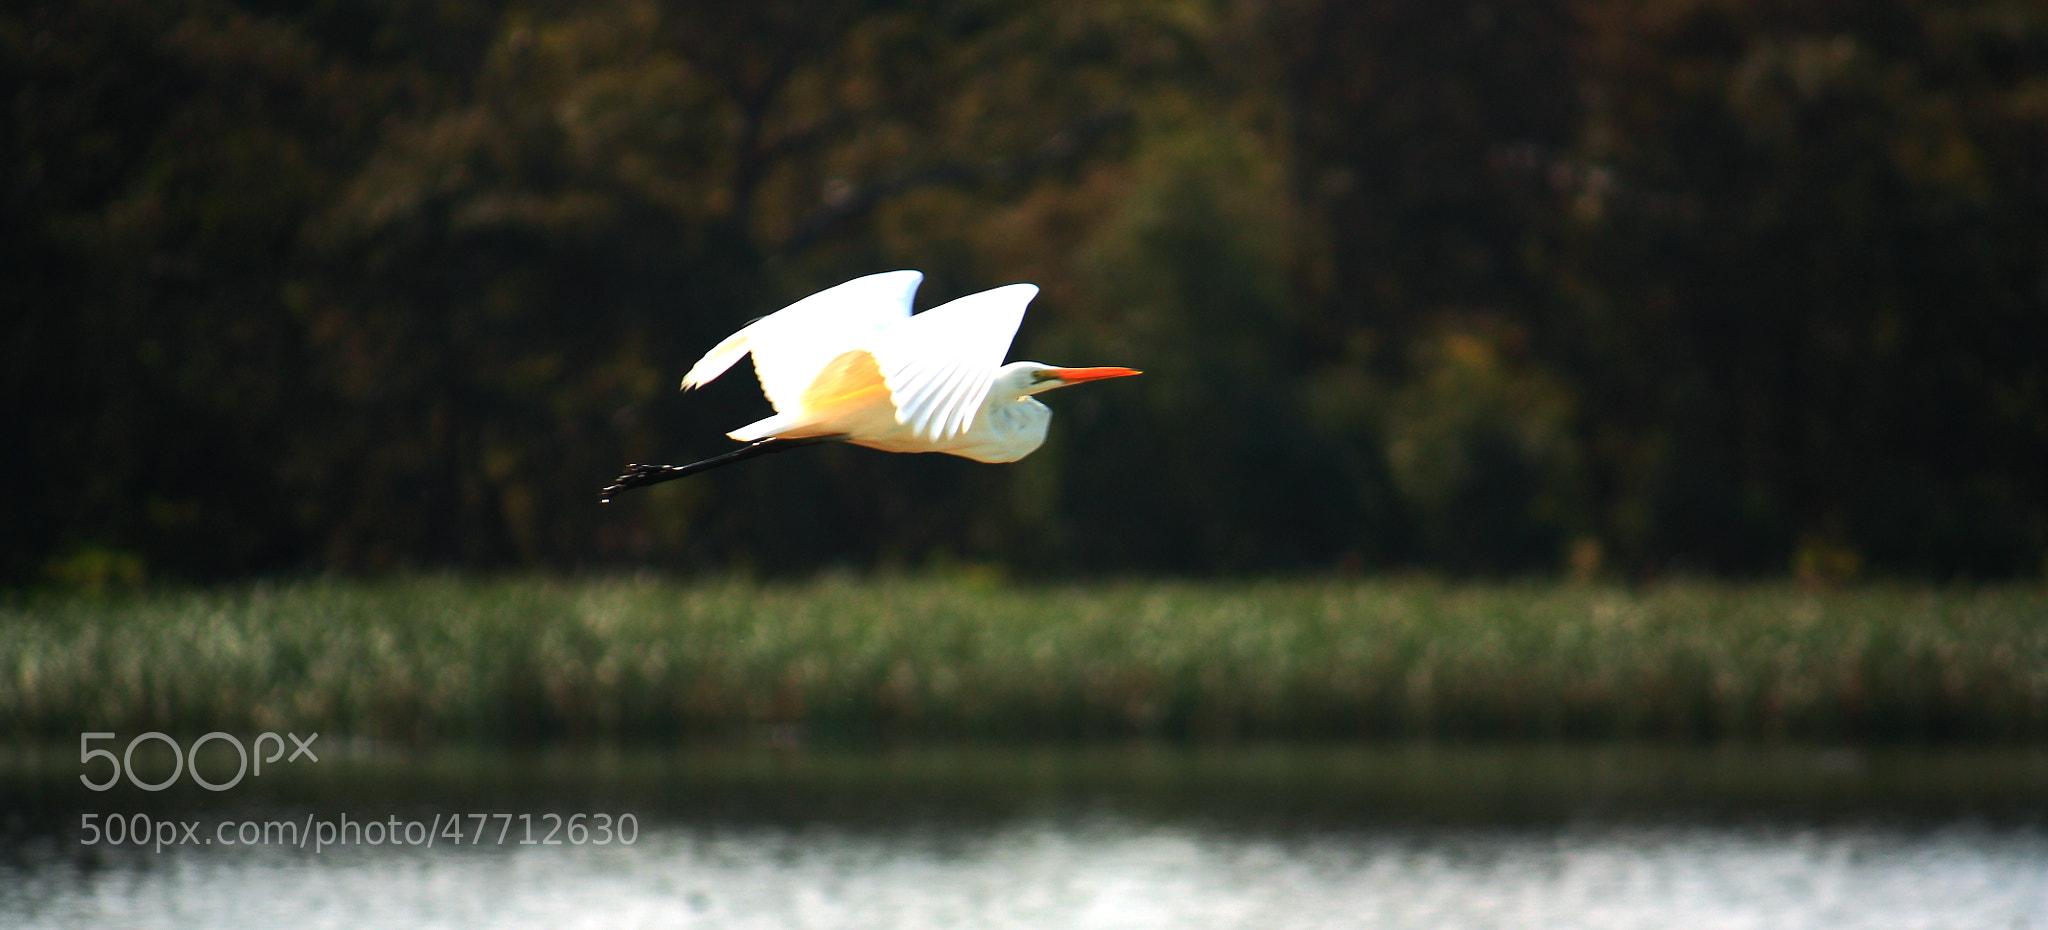 Photograph Flight of an Egret by Nicholas Dirnberger on 500px